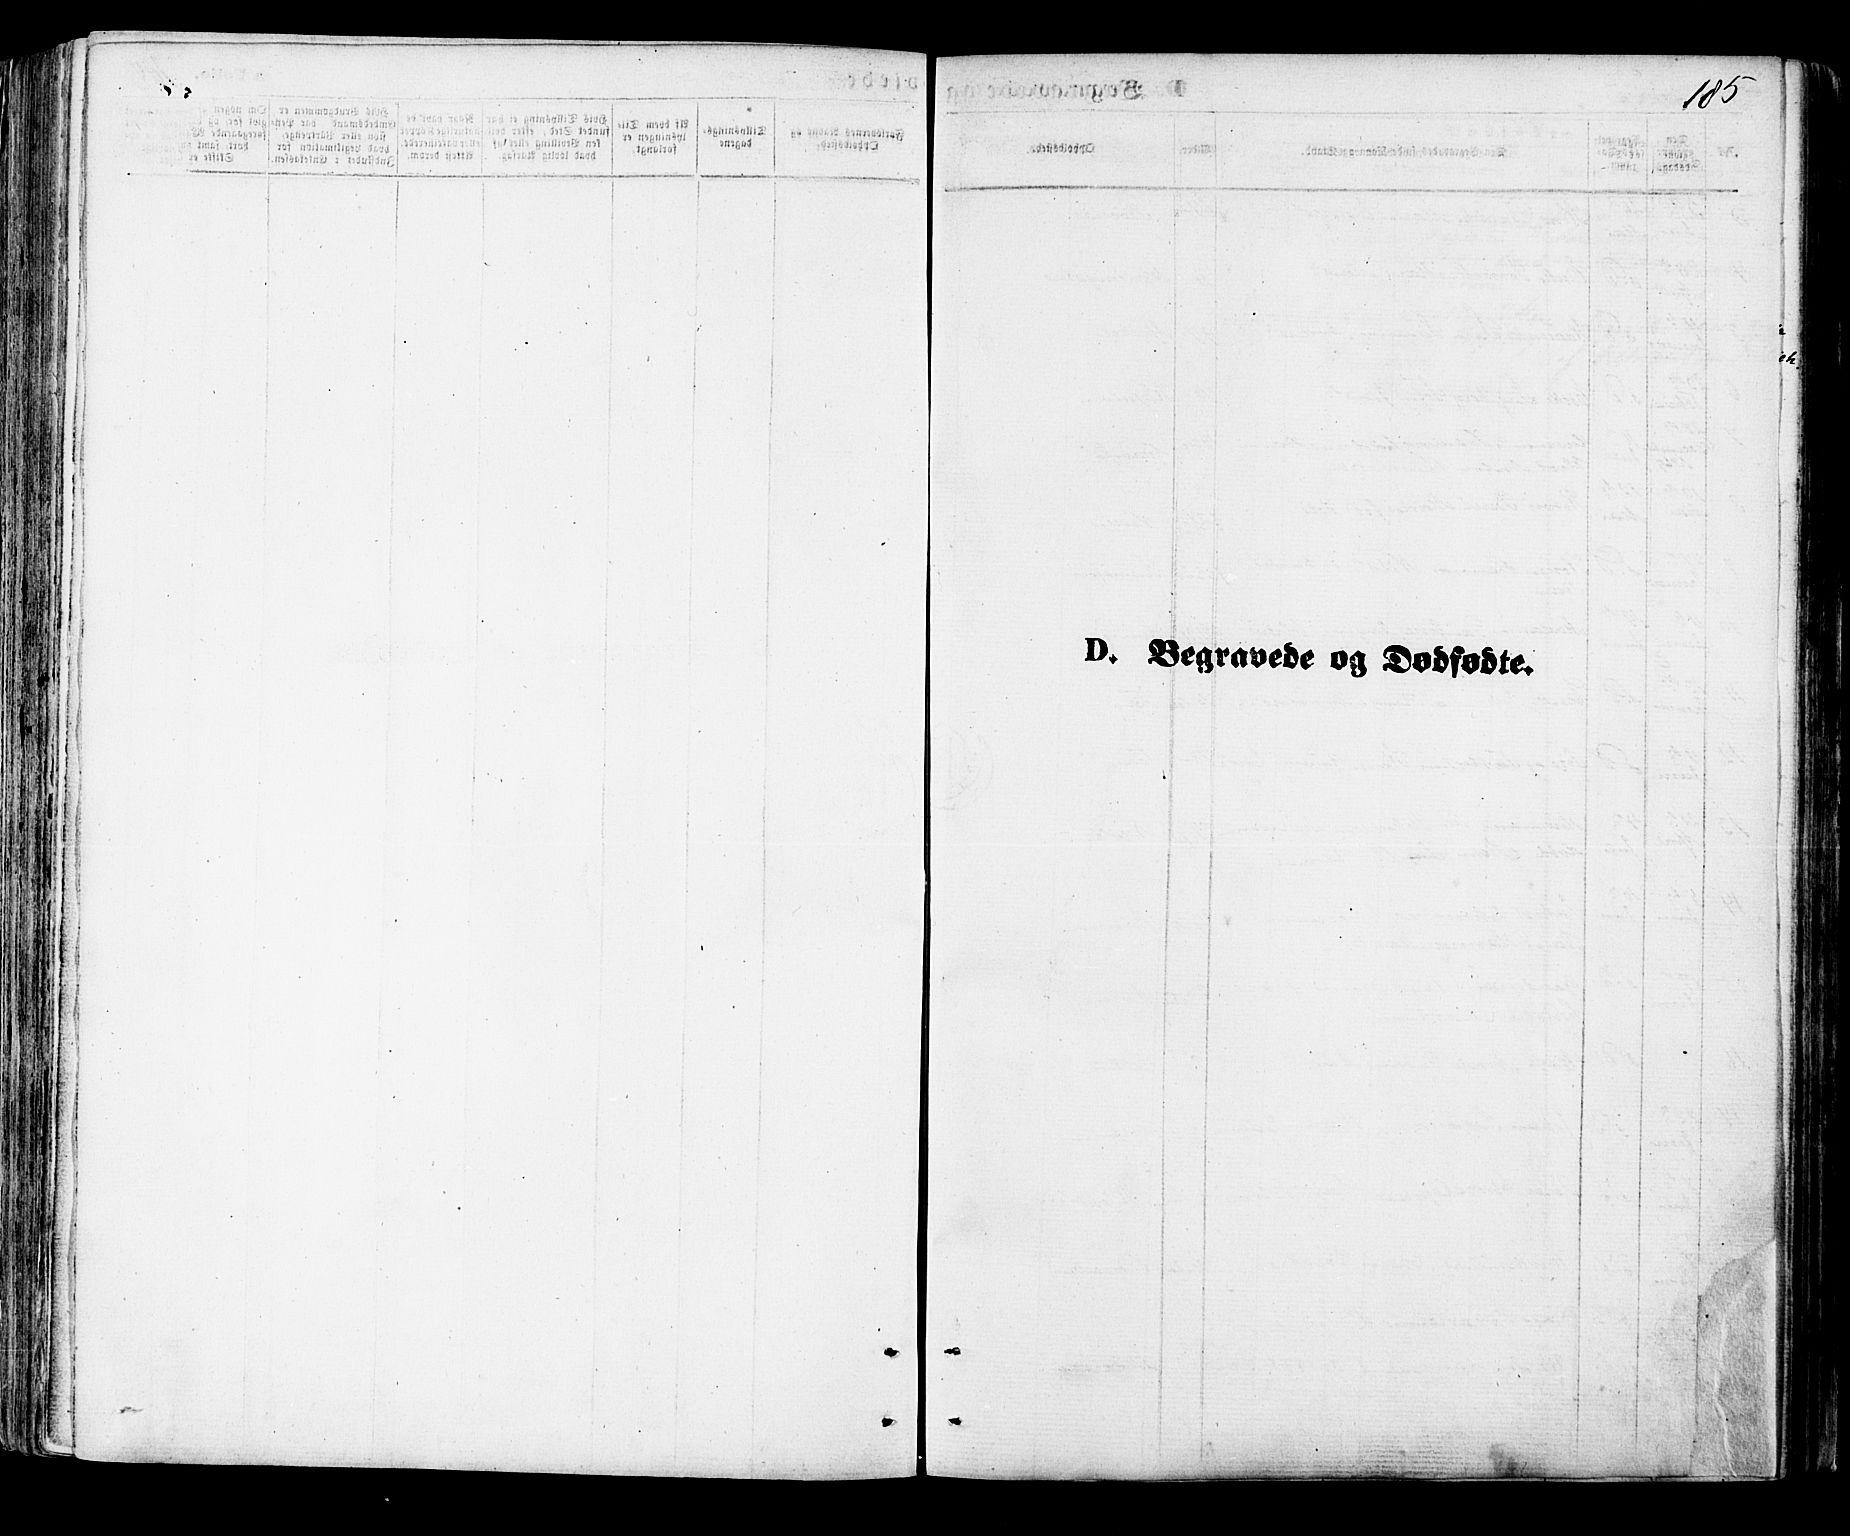 SAT, Ministerialprotokoller, klokkerbøker og fødselsregistre - Nordland, 891/L1301: Ministerialbok nr. 891A06, 1870-1878, s. 185